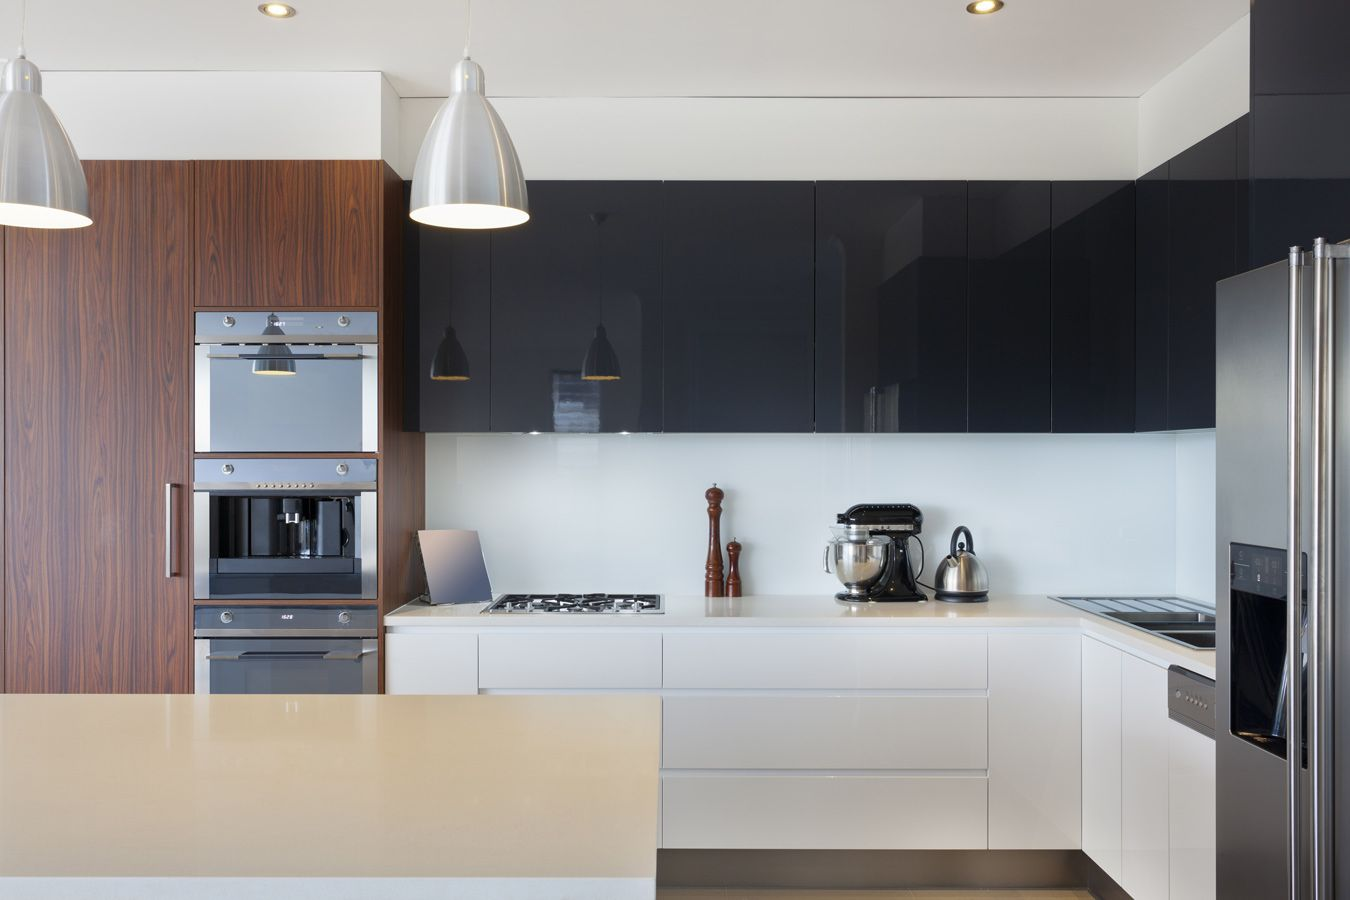 Keukenkast Zonder Greep : Corian werkblad moderne keuken zonder greep home